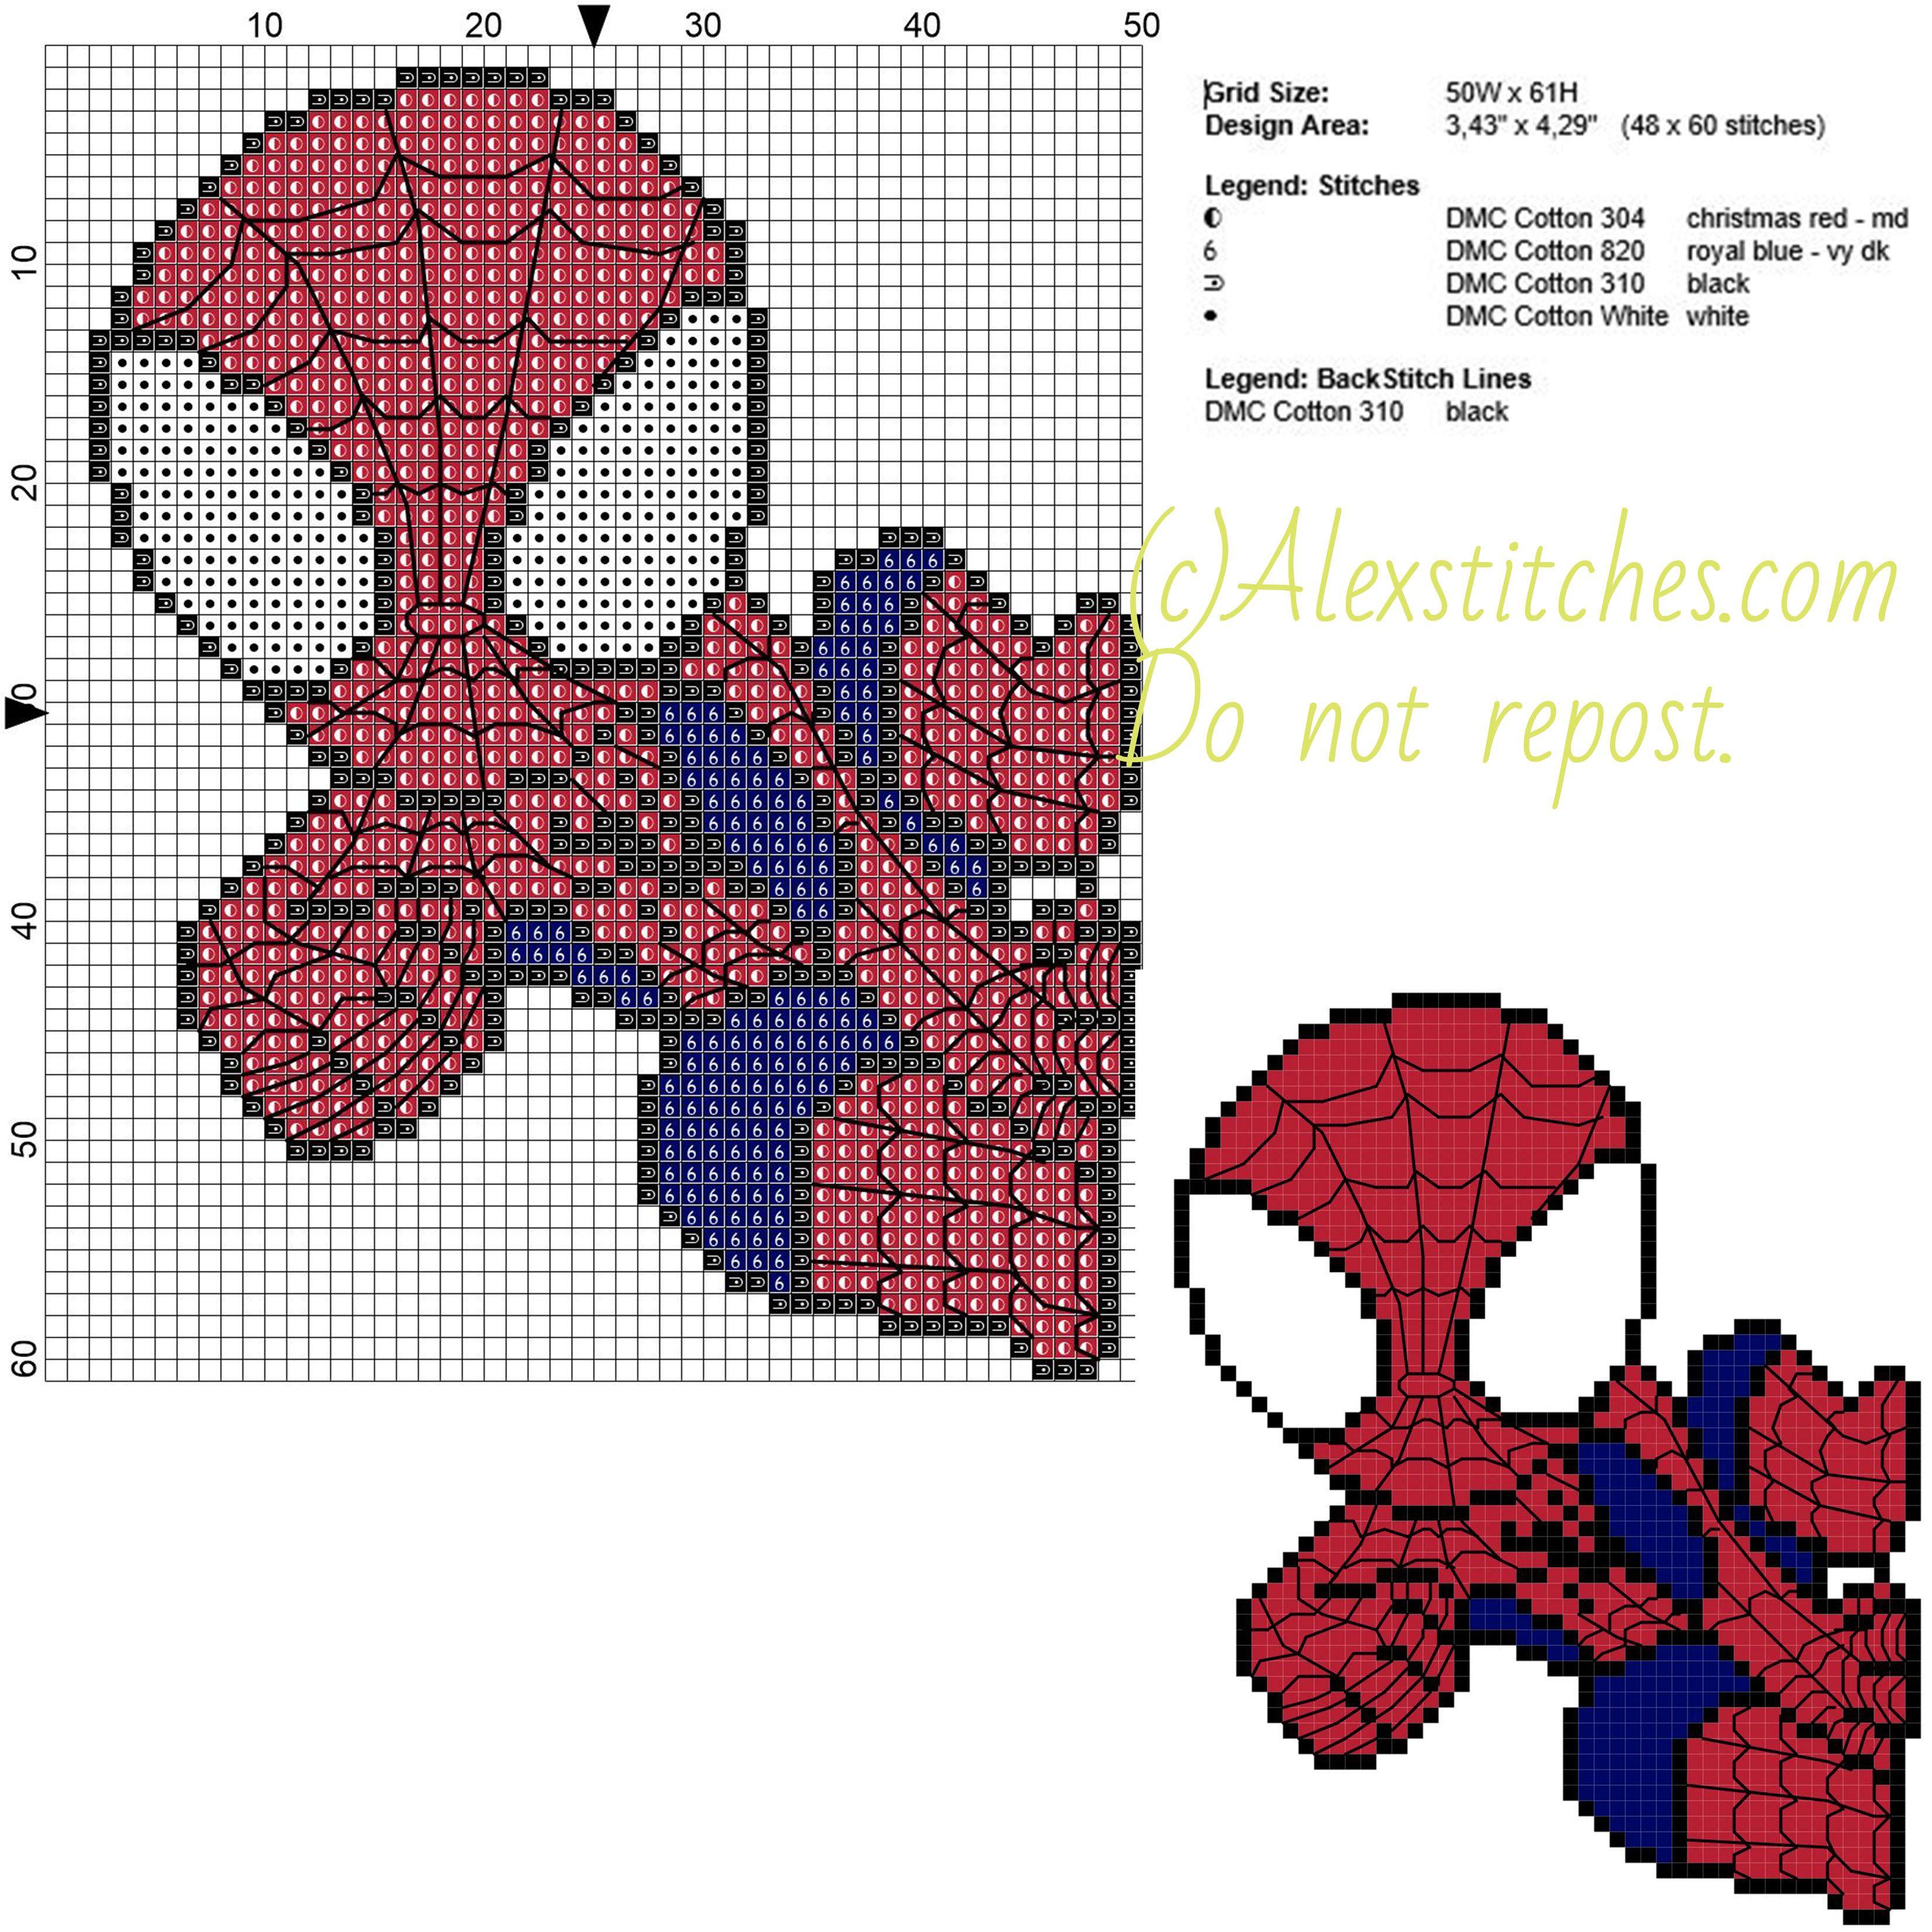 Spiderman free cross stitch pattern 50x61 5 colors super heroes spiderman free cross stitch pattern 50x61 5 colors jeuxipadfo Images